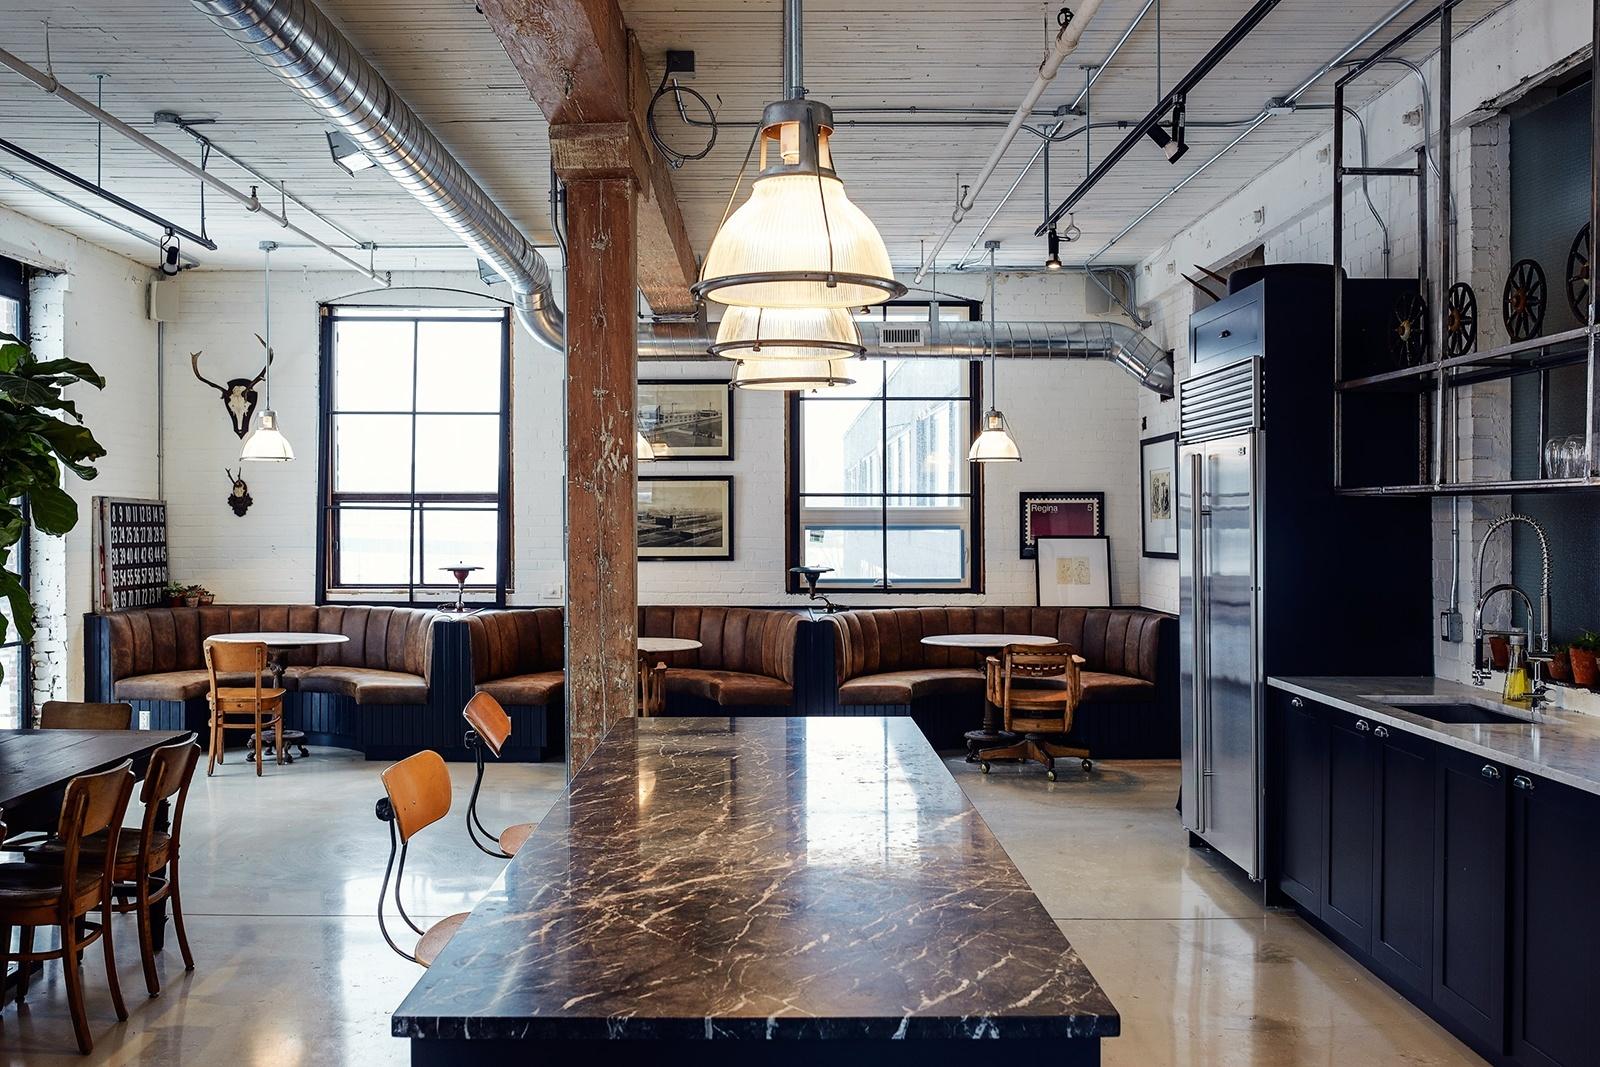 Square Glass Kitchen Table